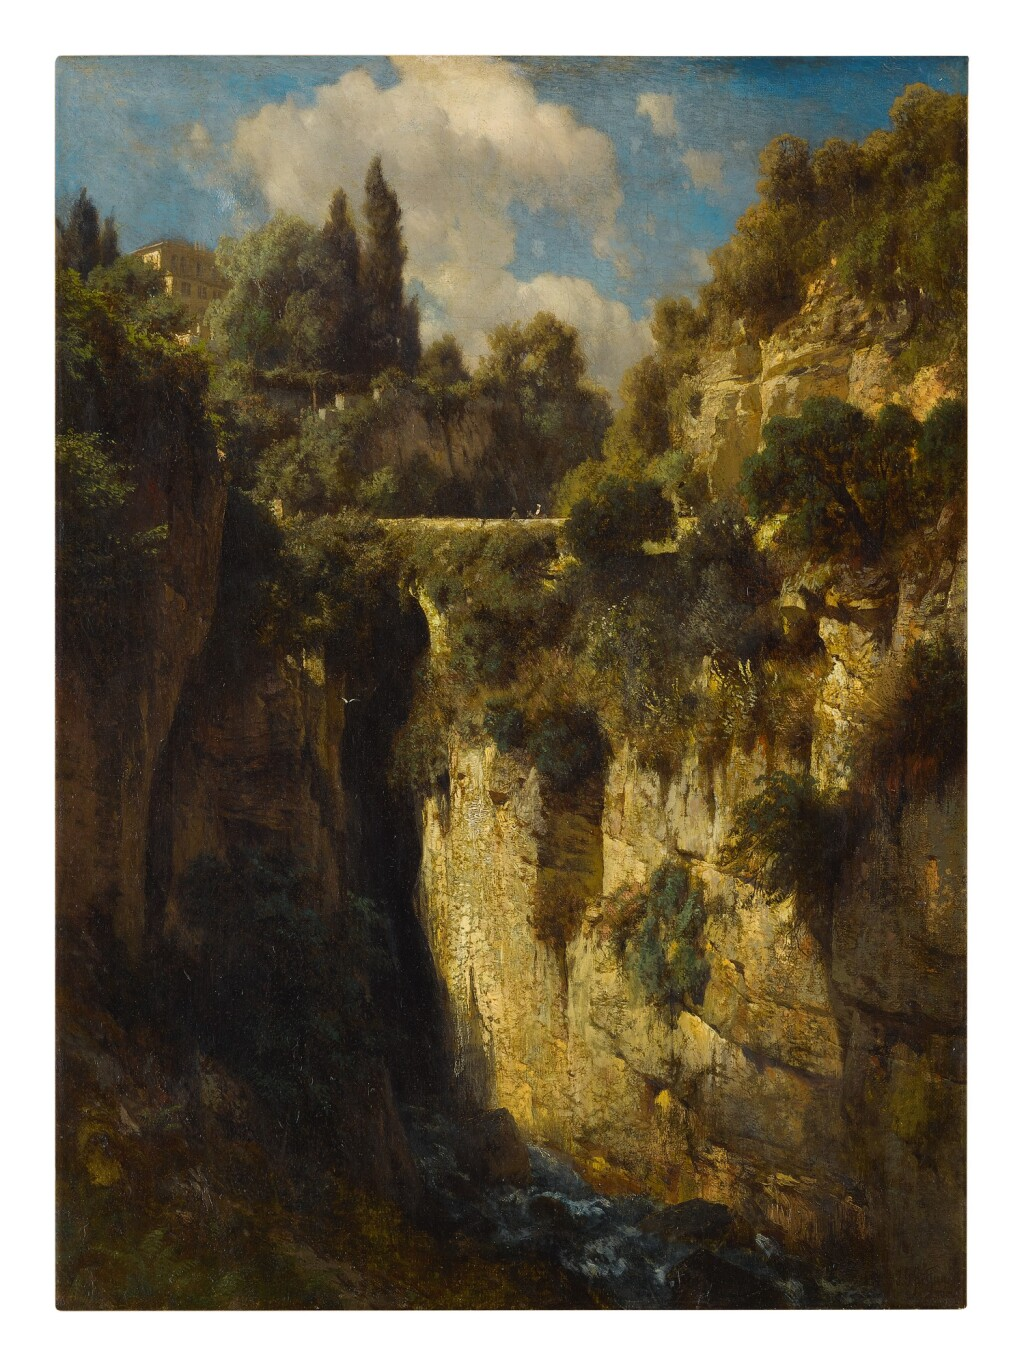 JOHANN GOTTFRIED STEFFAN   A MOUNTAINOUS LANDSCAPE WITH A WATERFALL